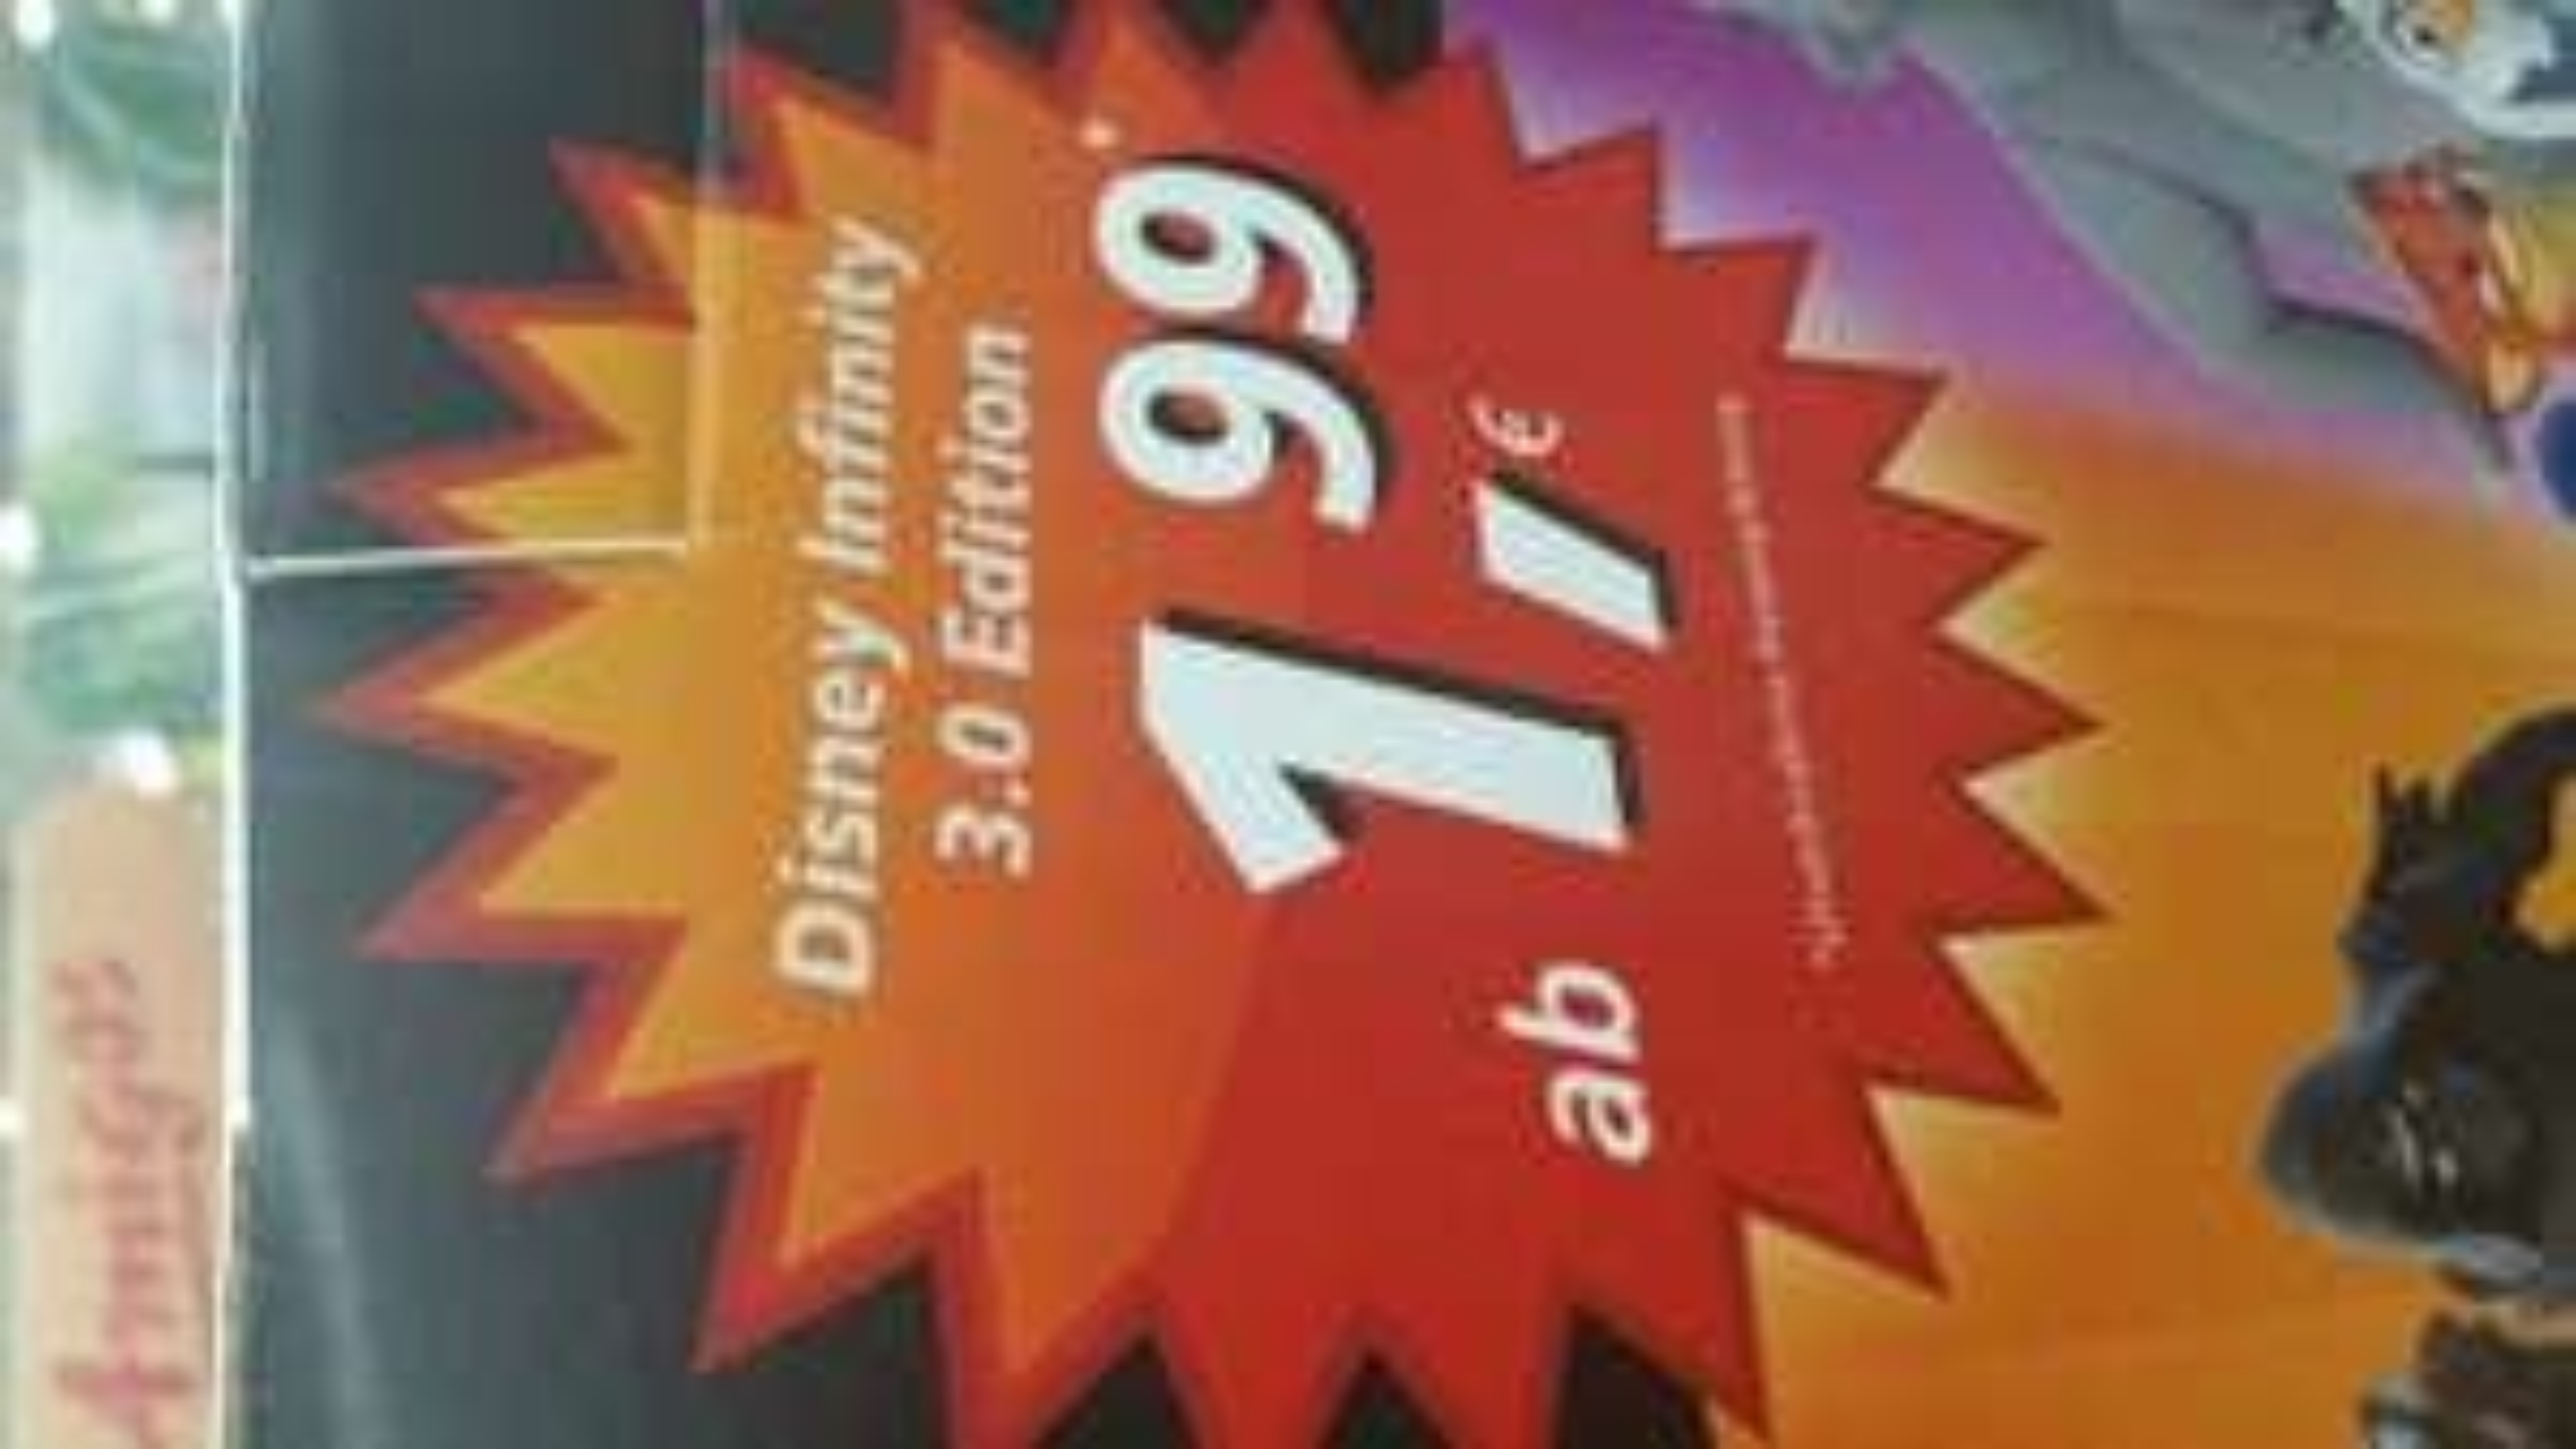 [real,- Göttingen] Disney INFINITY 3.0 Figuren 1,99€ (PVG 5,00€)